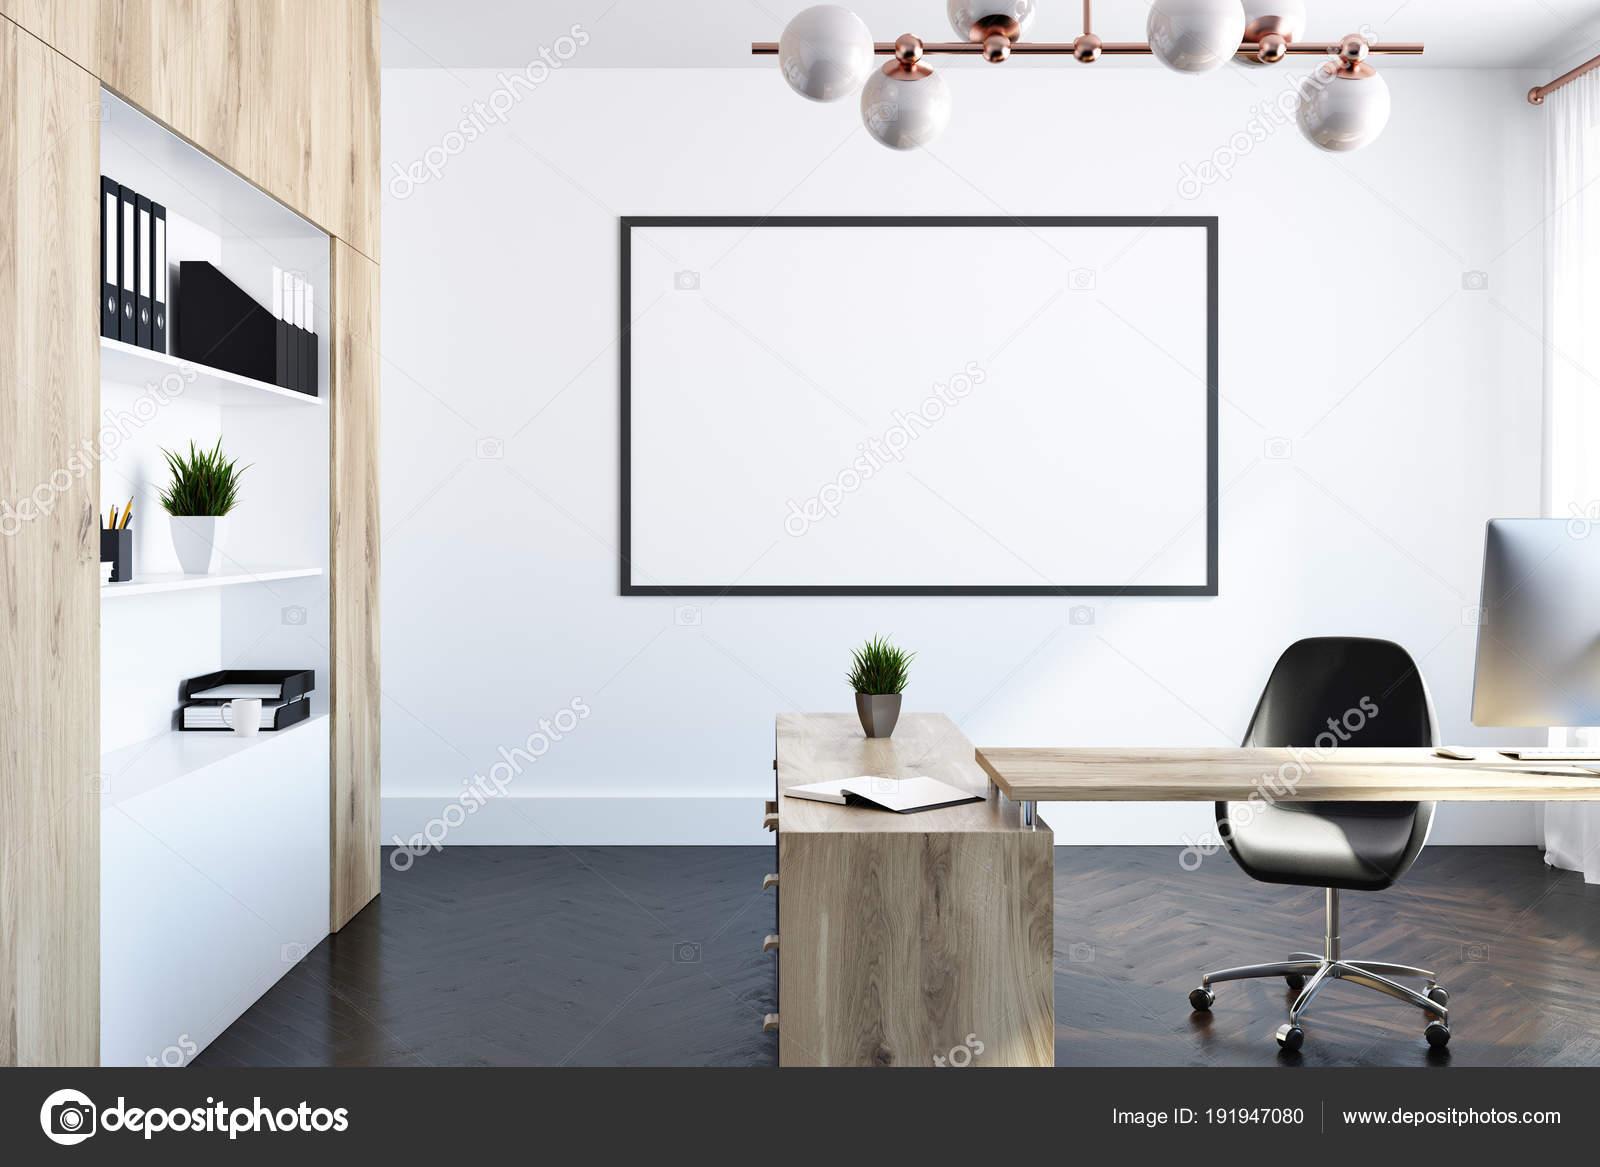 https://st3.depositphotos.com/2673929/19194/i/1600/depositphotos_191947080-stockafbeelding-bedrijf-manager-kantoor-interieur-poster.jpg